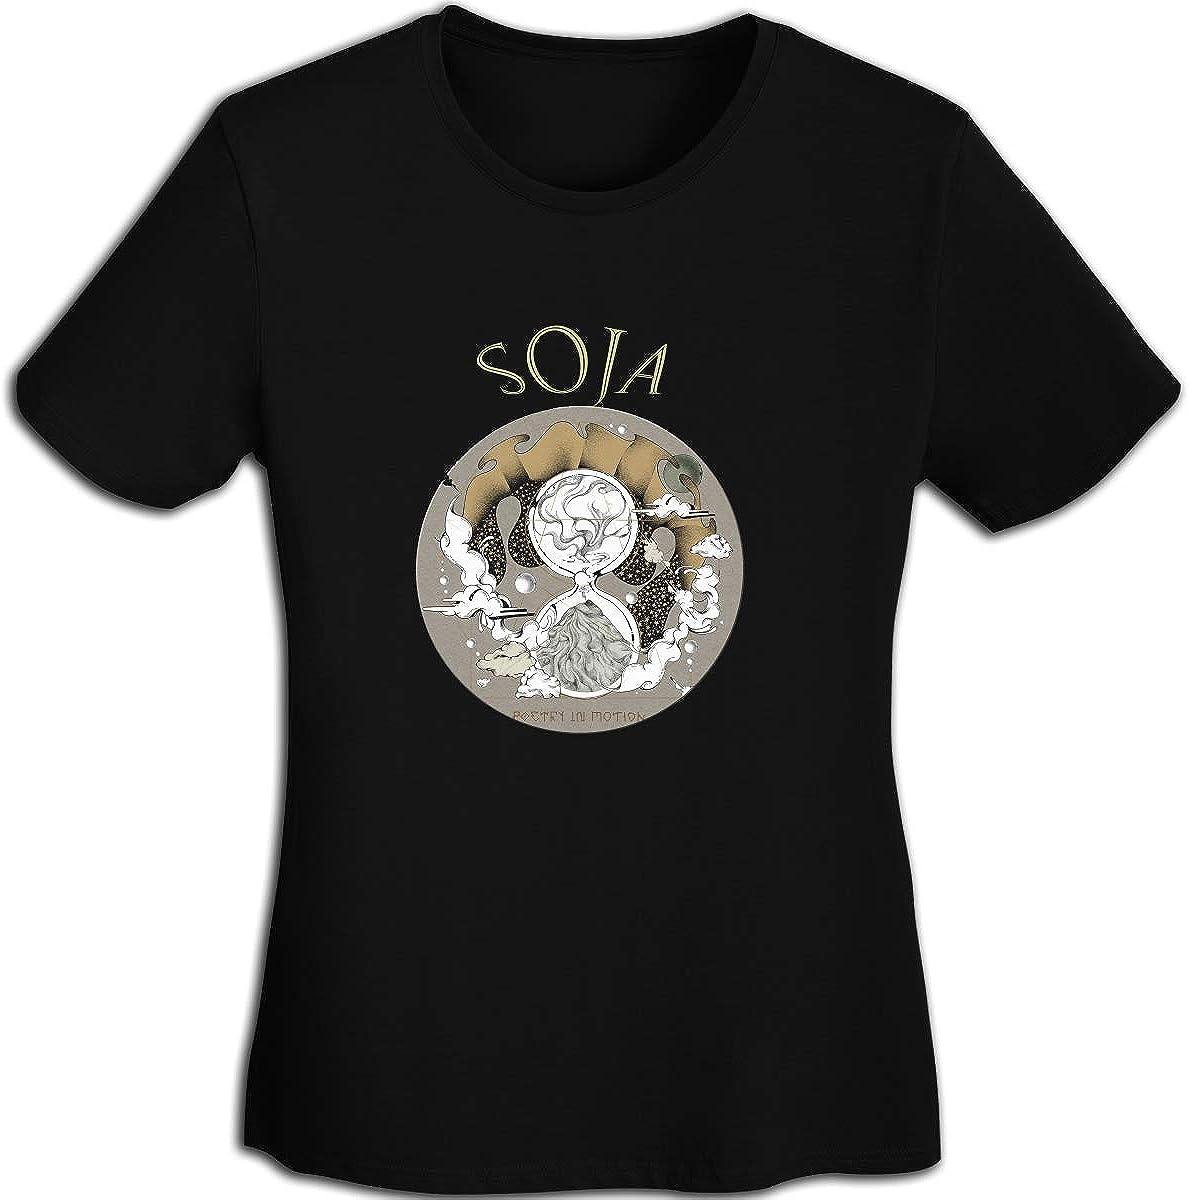 FankTasf SOJA Womens Fashion T-Shirt Teen Girl Printed Short-Sleeved T-Shirt